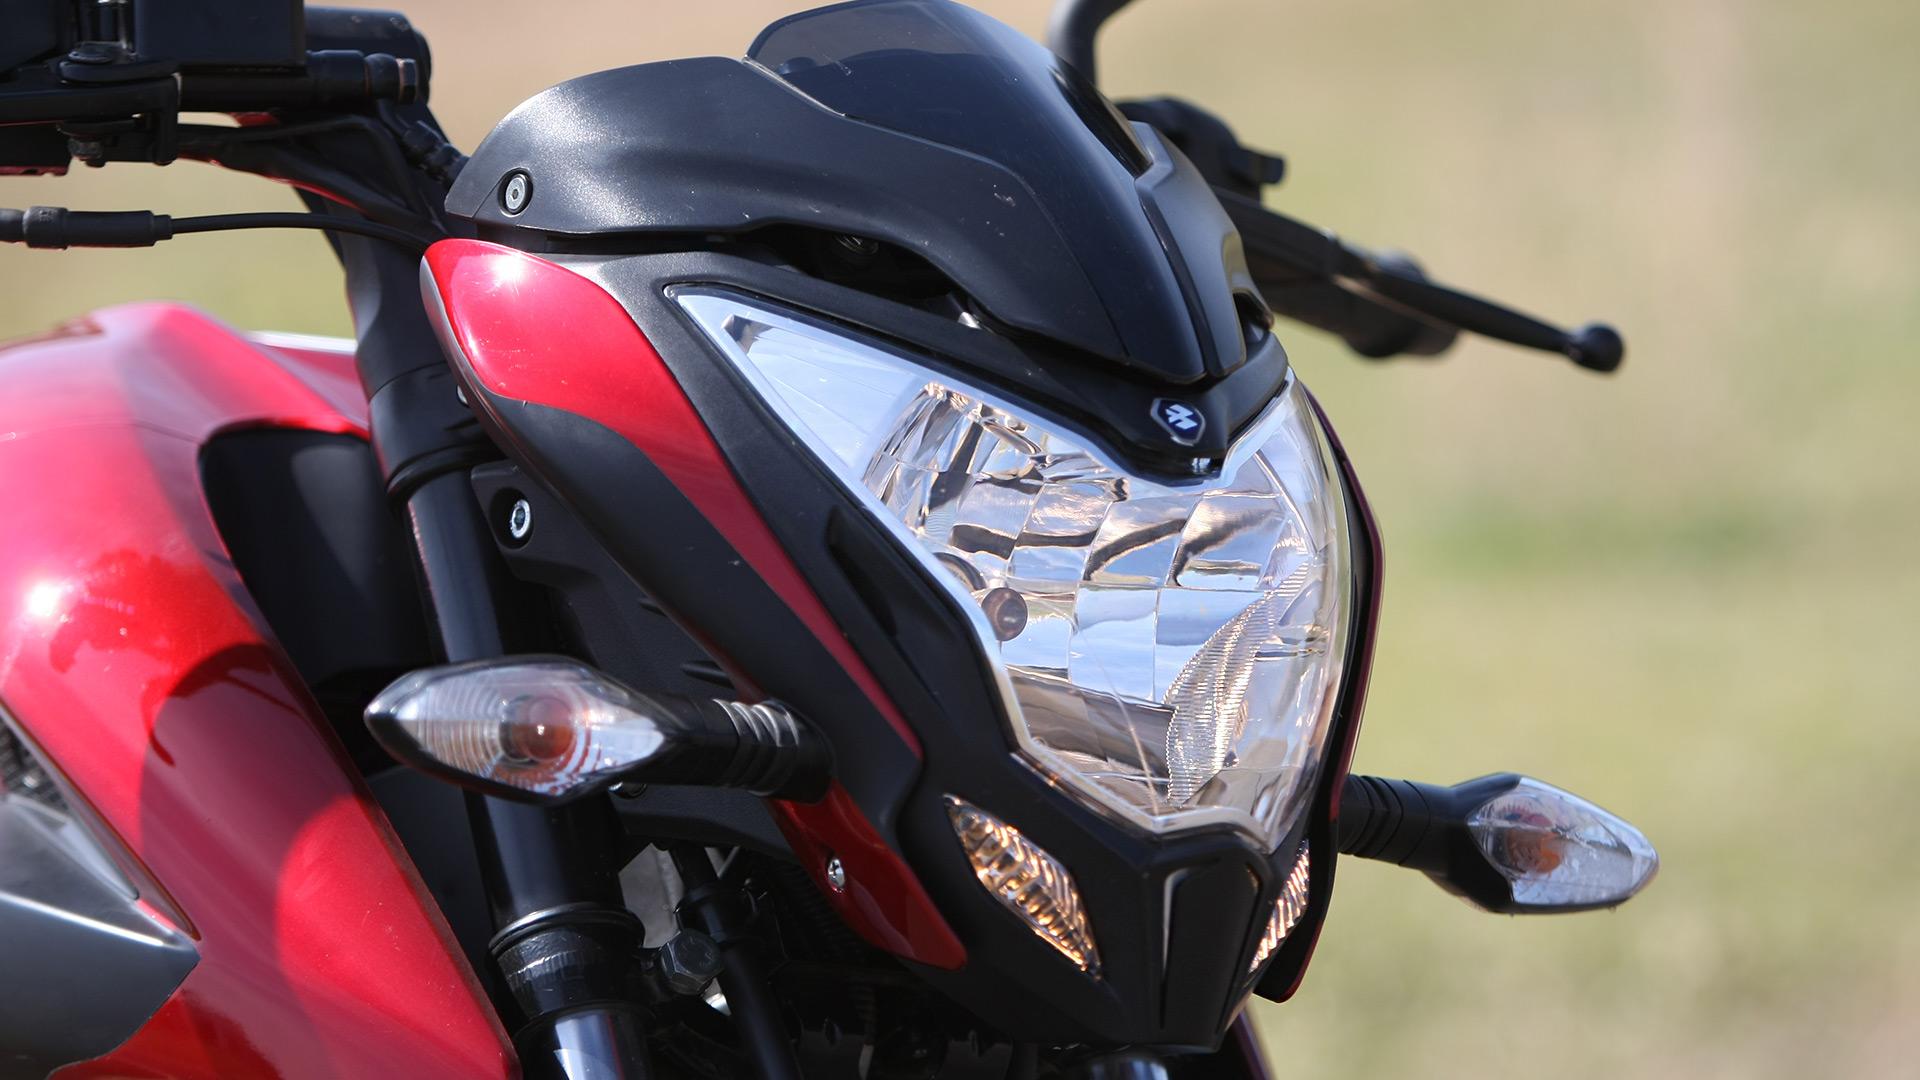 Bajaj Pulsar 200 Ns 2013 Std Price Mileage Reviews